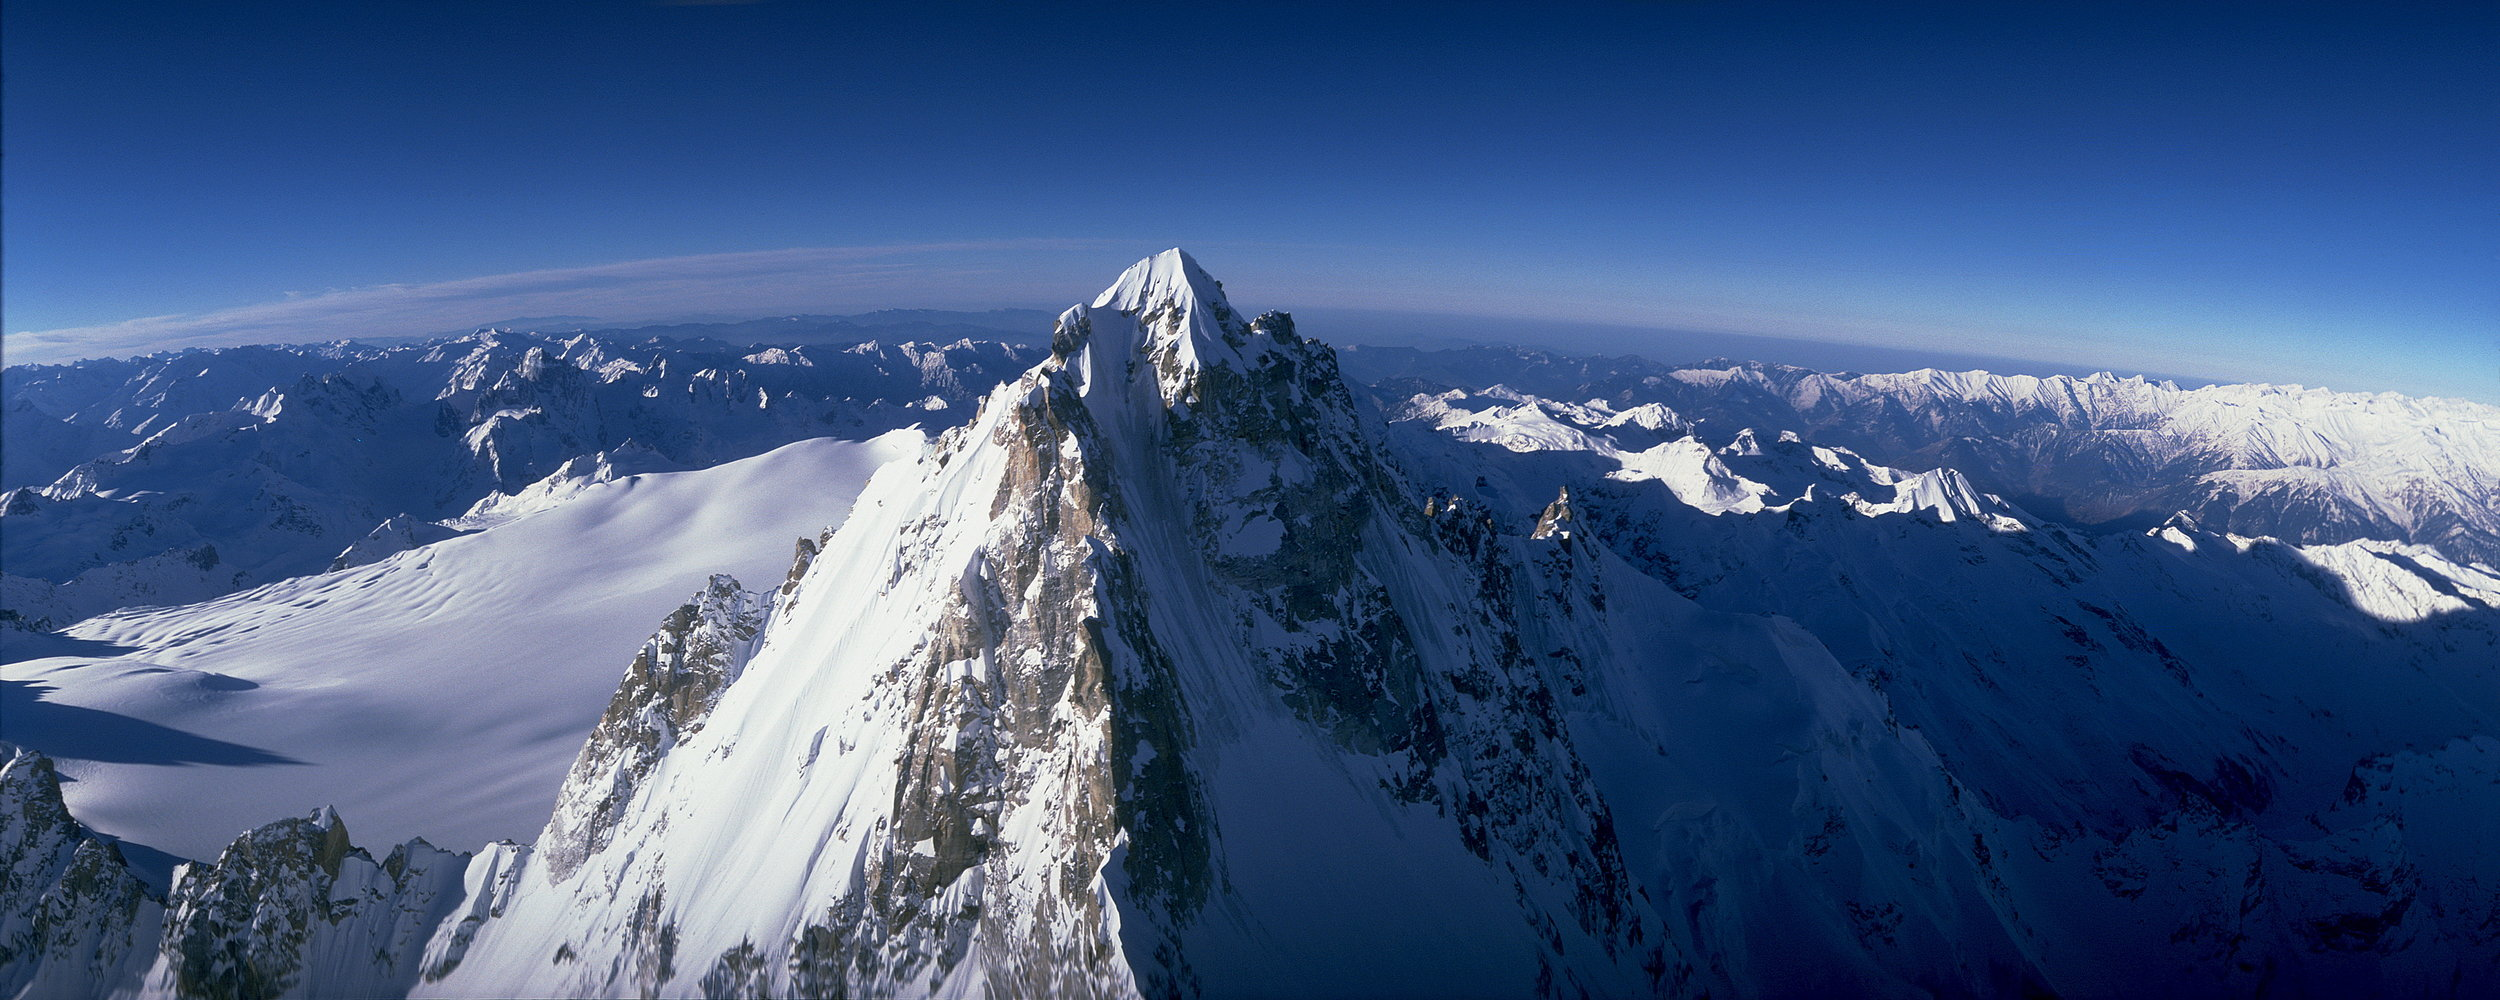 India Elemental Adventure  - Mt Indrasan